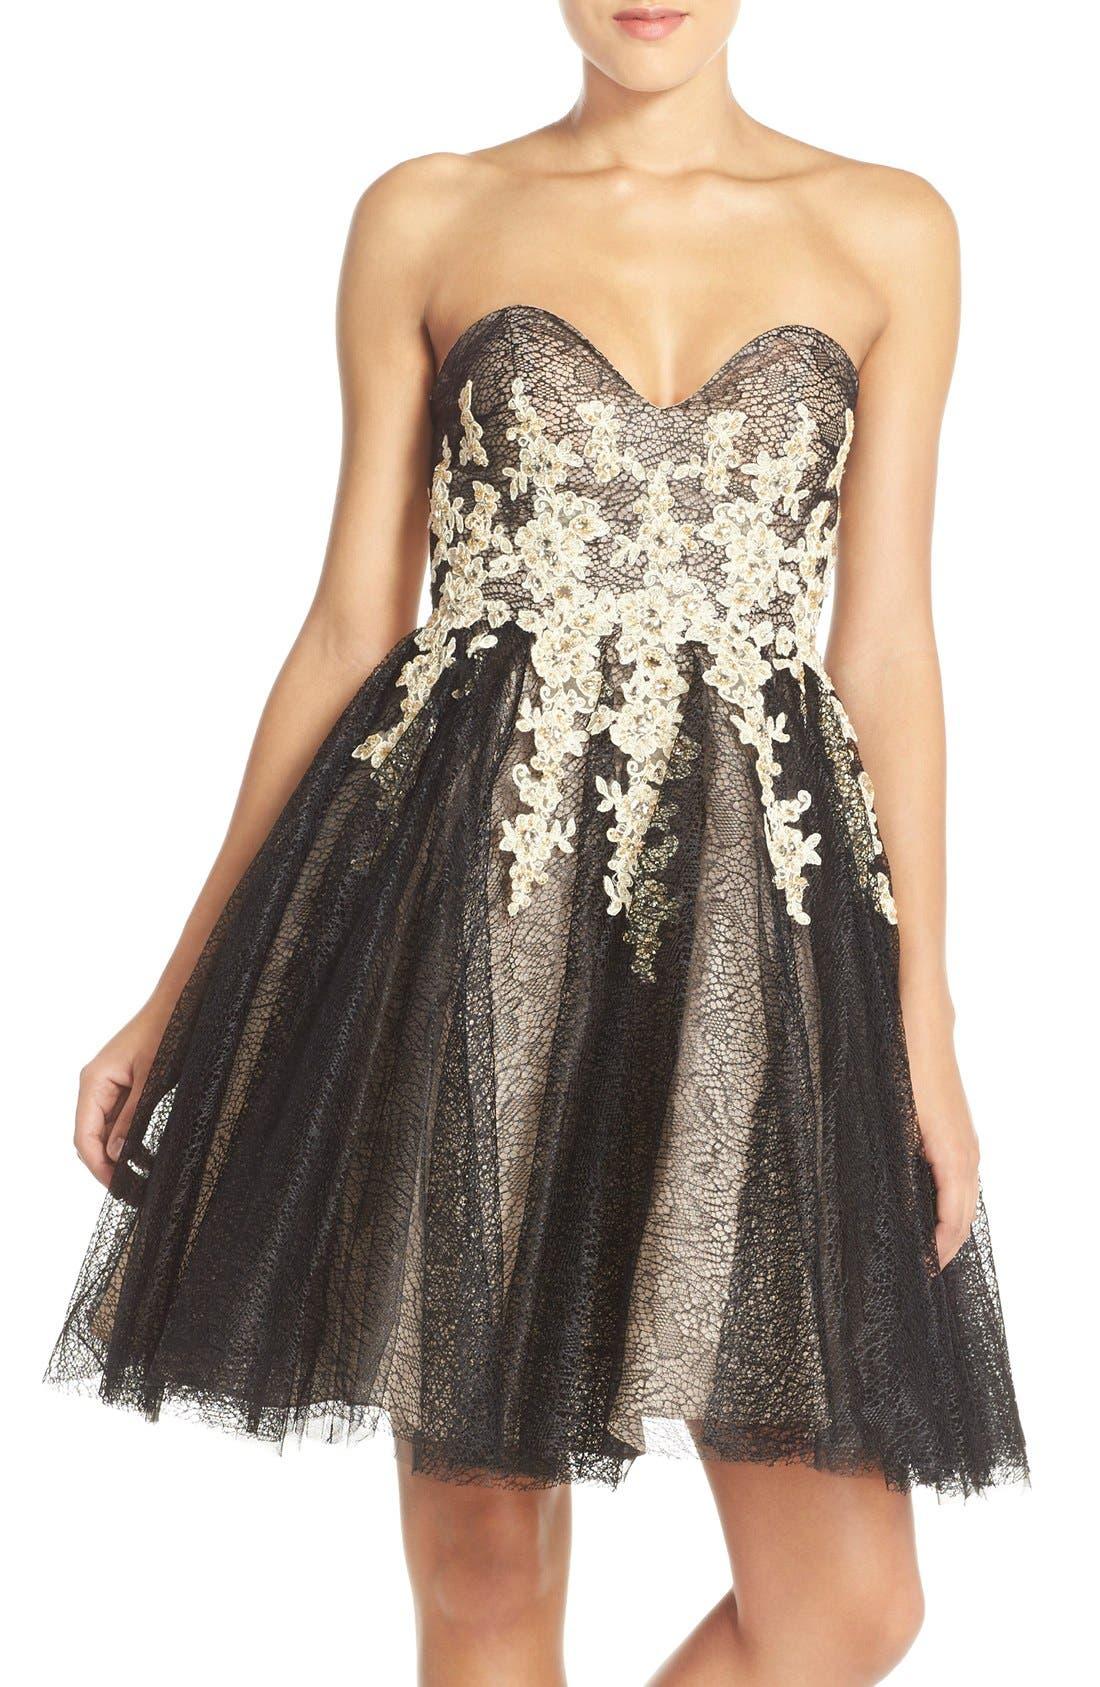 Alternate Image 1 Selected - Terani Couture Appliqué Lace Fit & Flare Dress